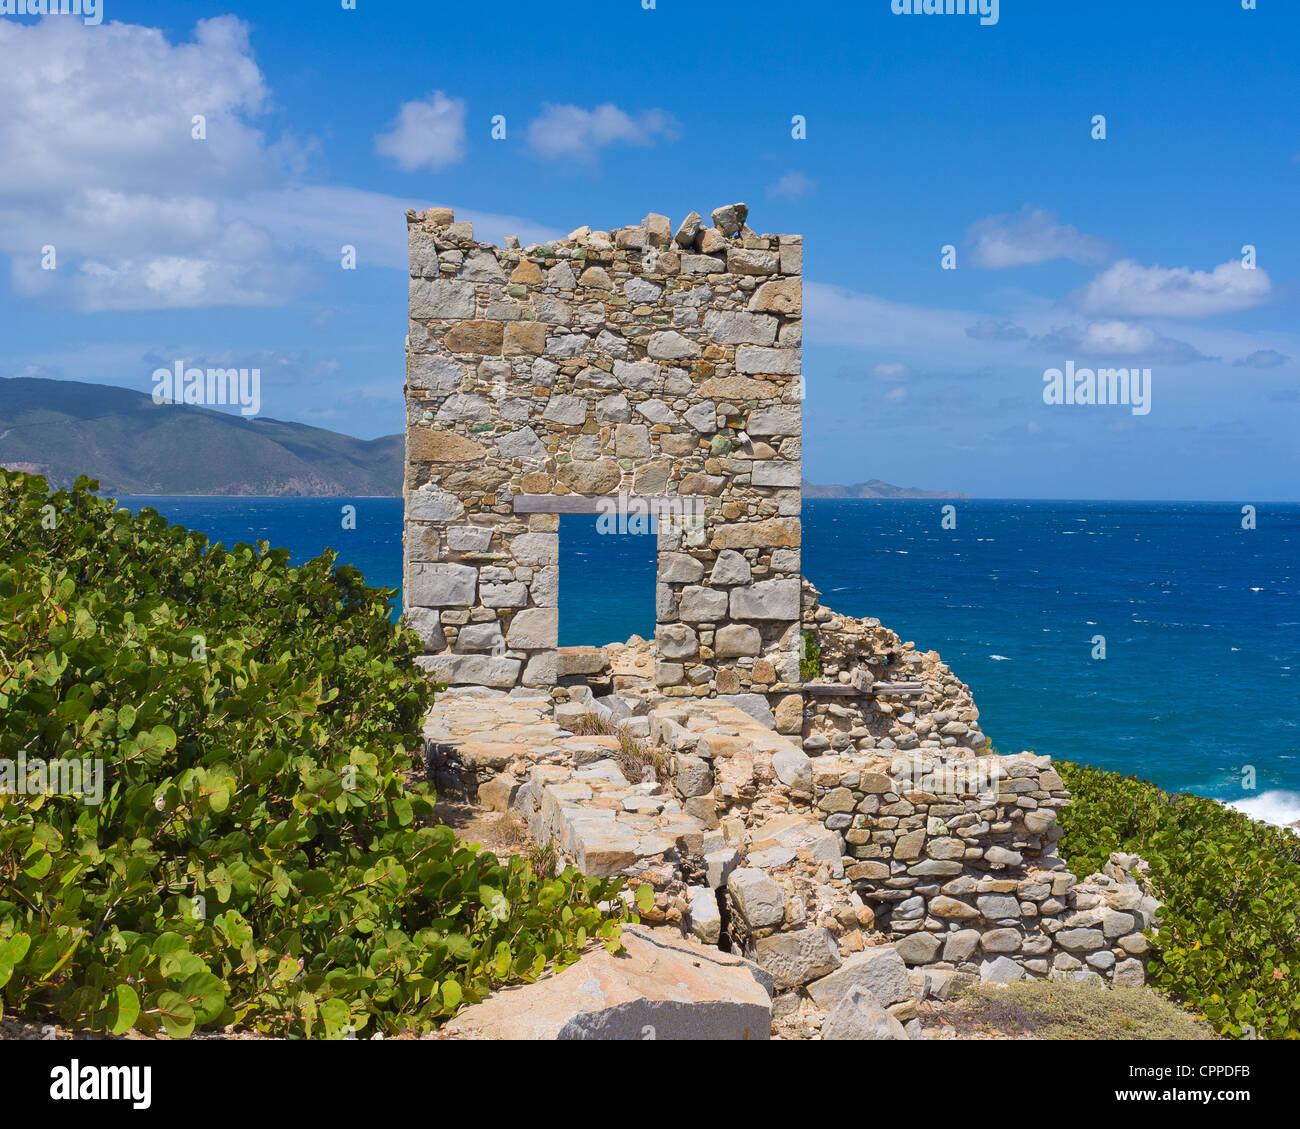 Virgin Gorda, Britische Jungferninseln, Karibik aufgegeben Copper Mine (1837-1862) Ruinen - Nationalpark Stockbild